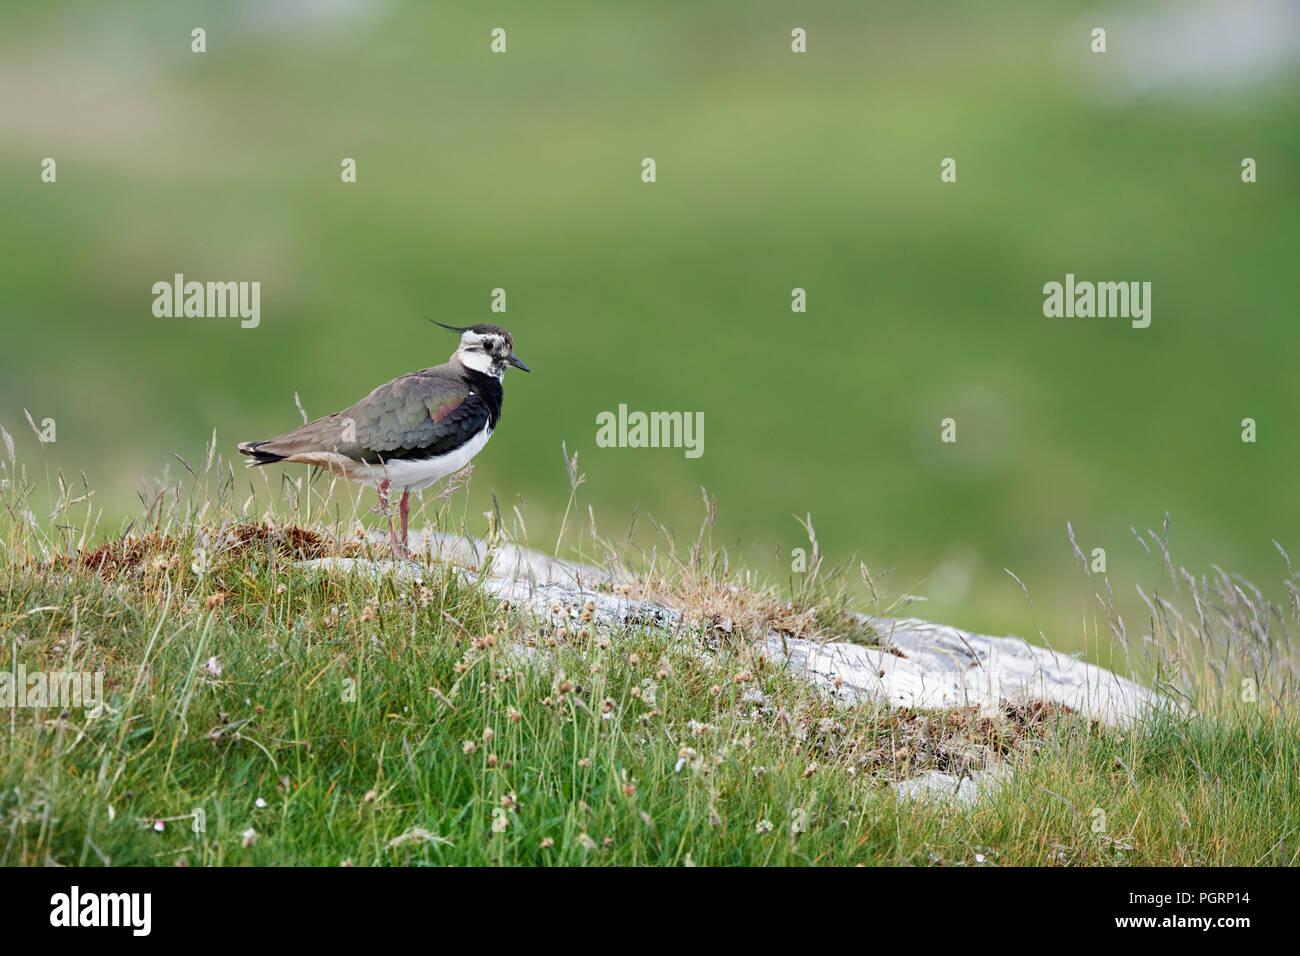 Northern lapwing, Vanellus vanellus, UK - Stock Image